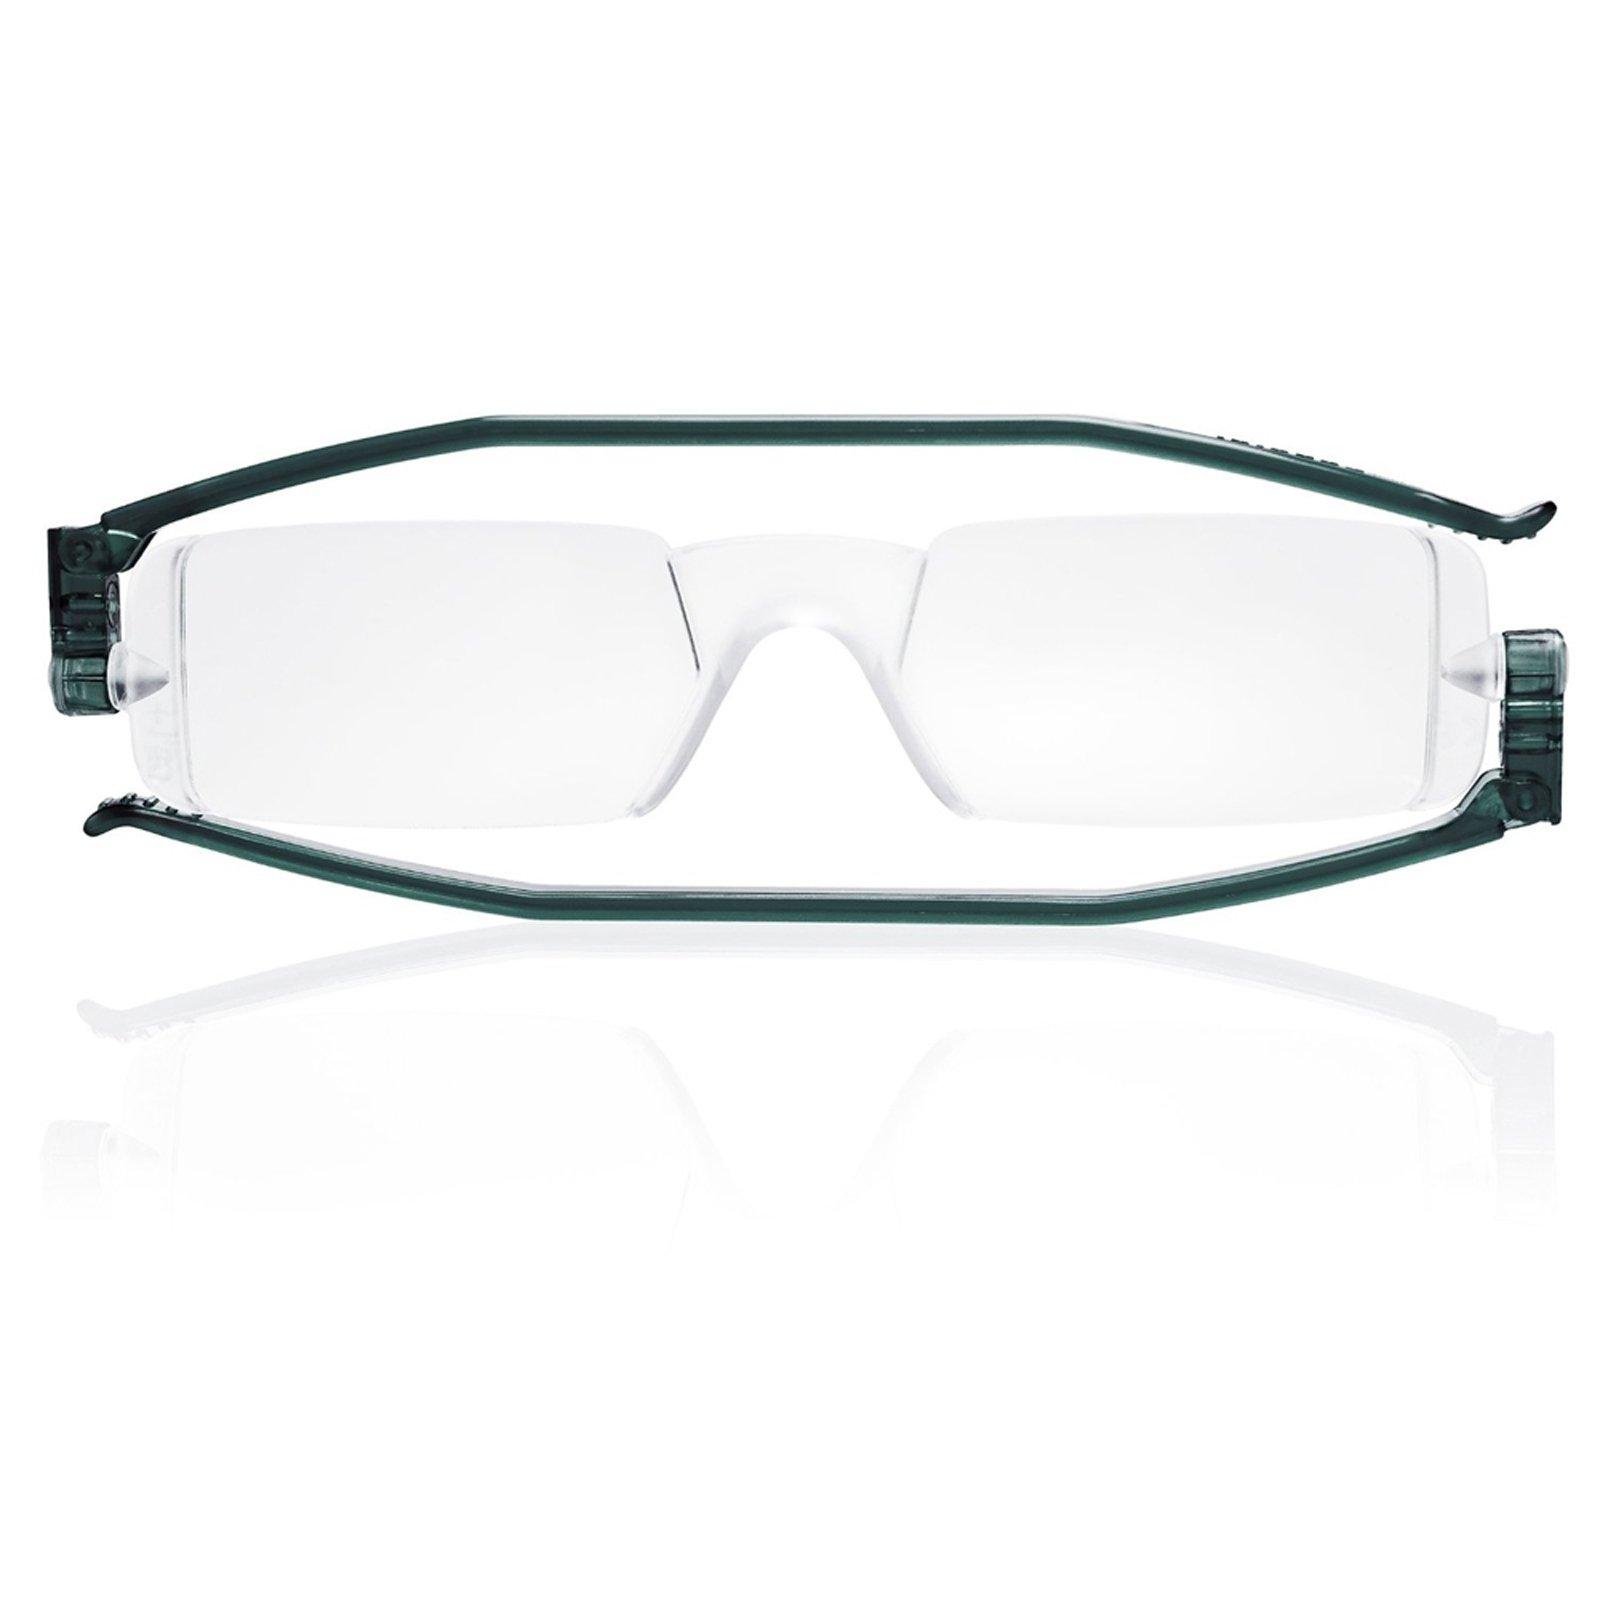 Nannini Italy Grey Reading Glasses - 1.0 Optic